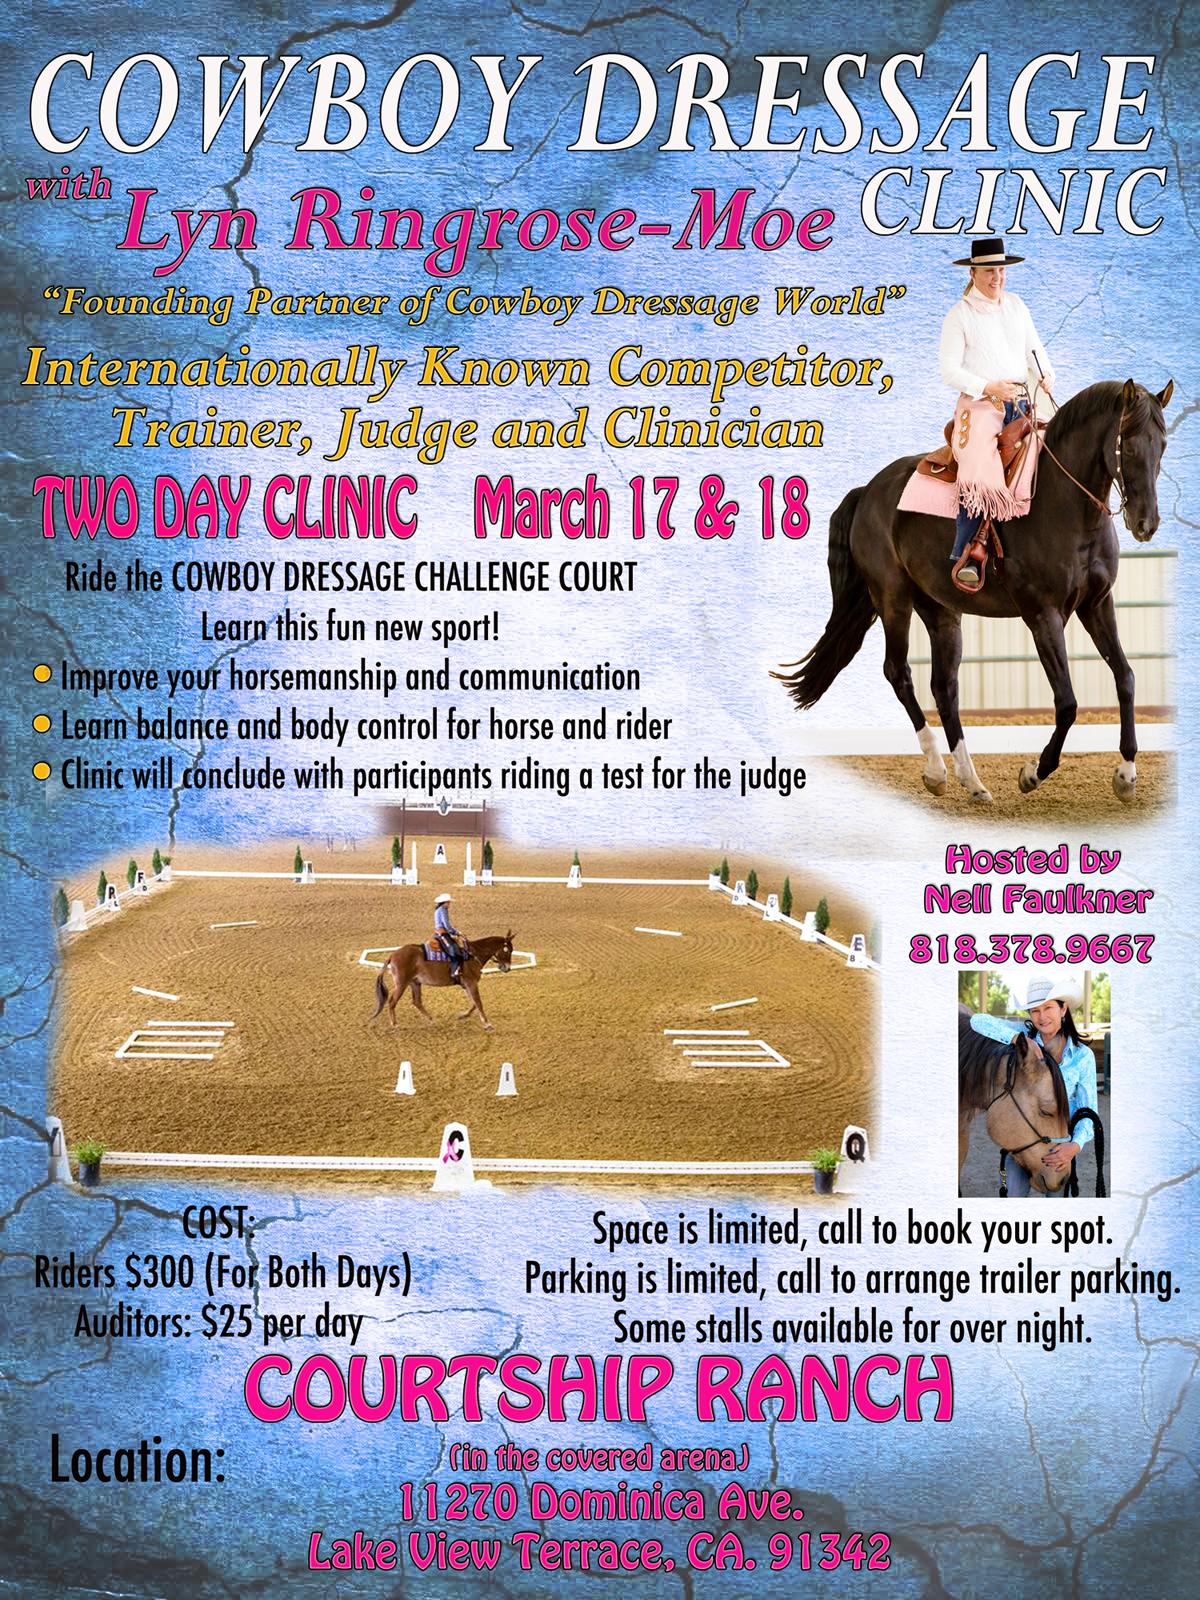 Lyn Ringrose-Moe, Cowboy Dressage, Clinic, Courtship Ranch